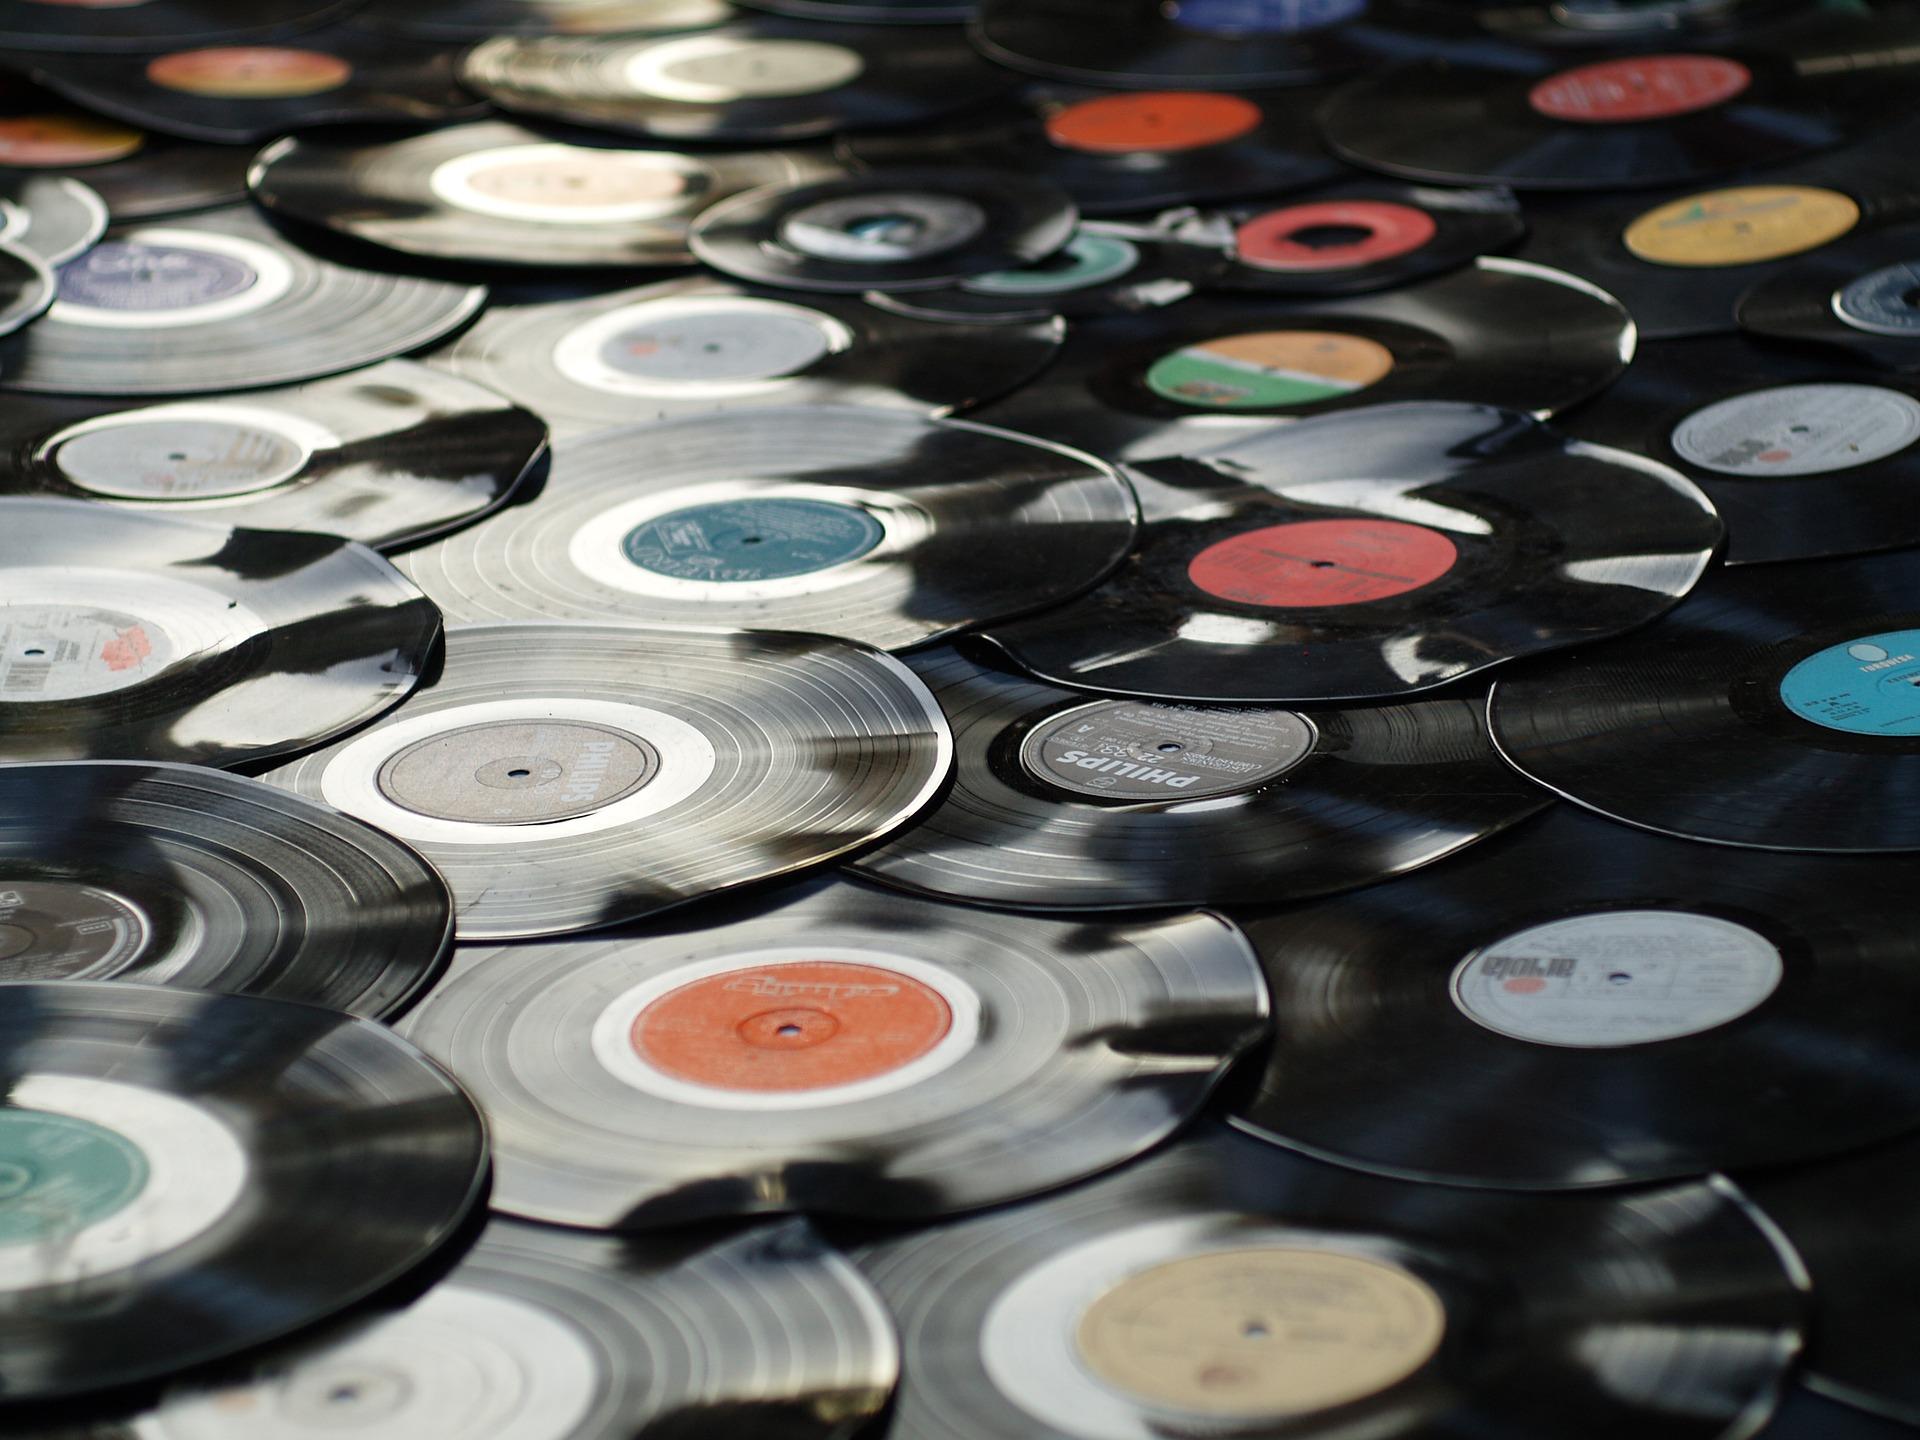 BEST SOUNDING RECORDS ON VINYL